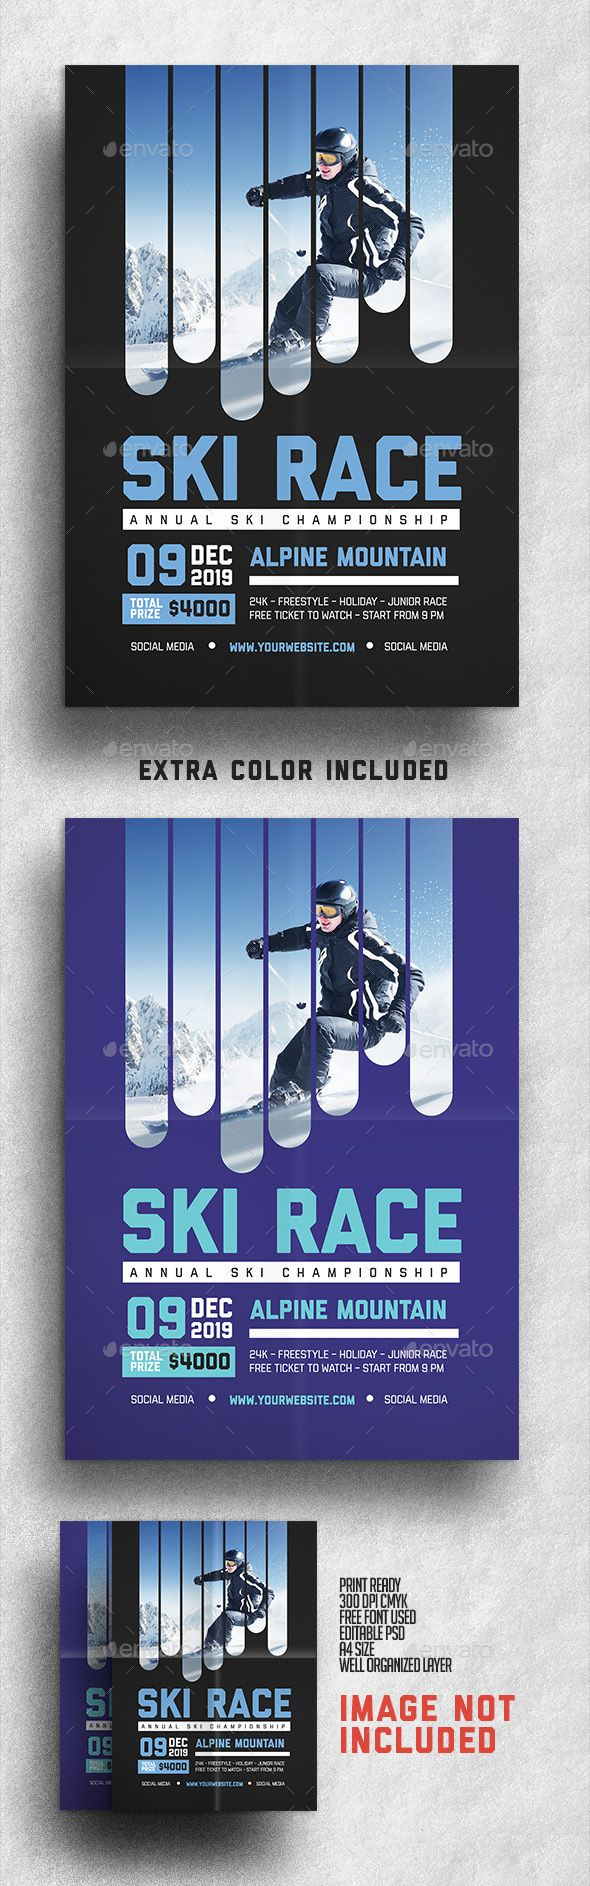 Ski Race Flyer Template PSD